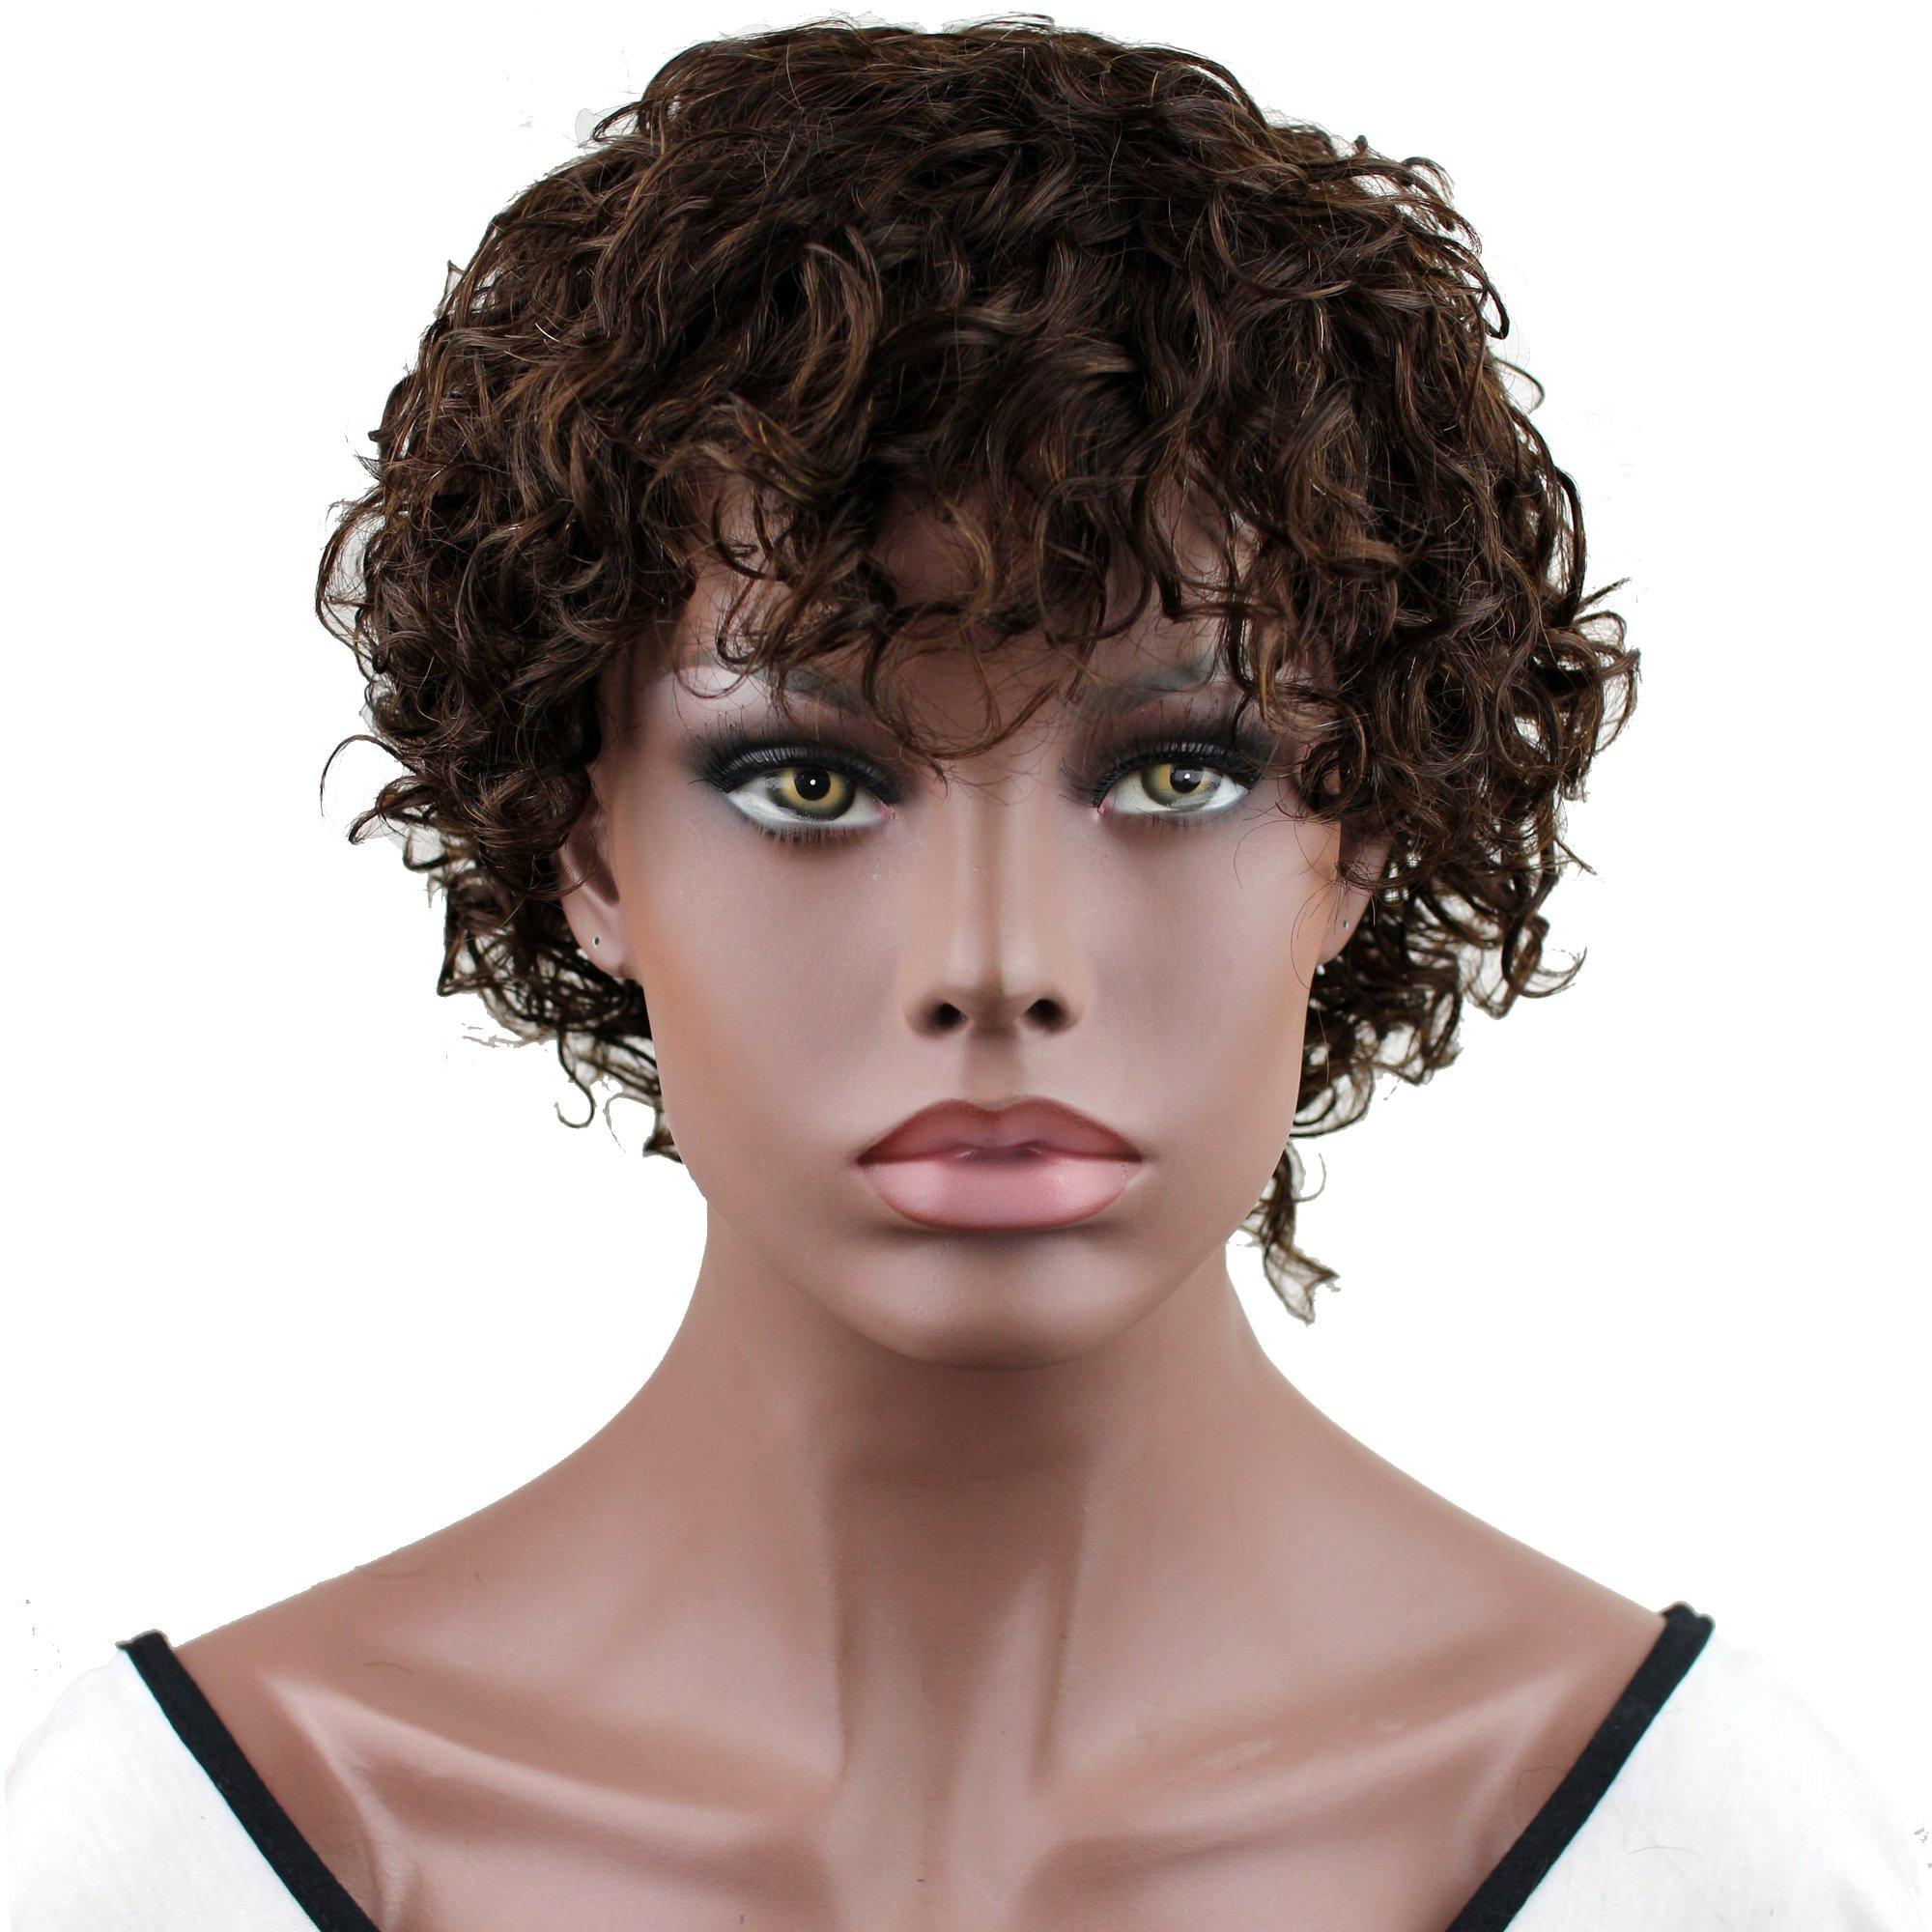 amazoncom dreambeauty short natural full wig 100